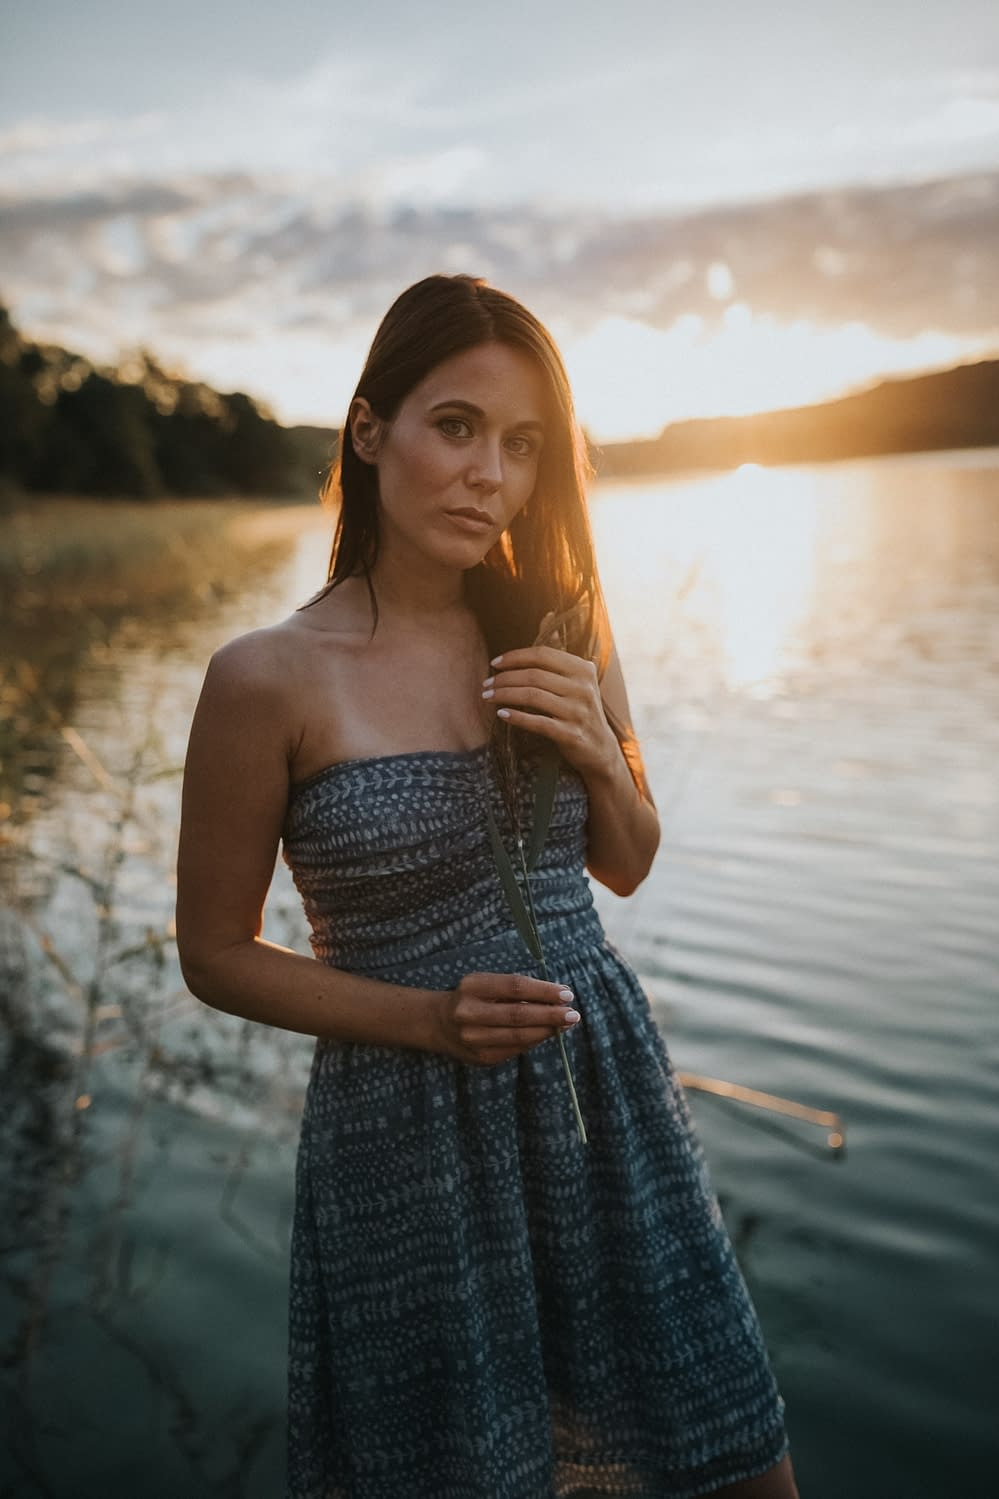 Sunrise Portraits at lake Mattsee